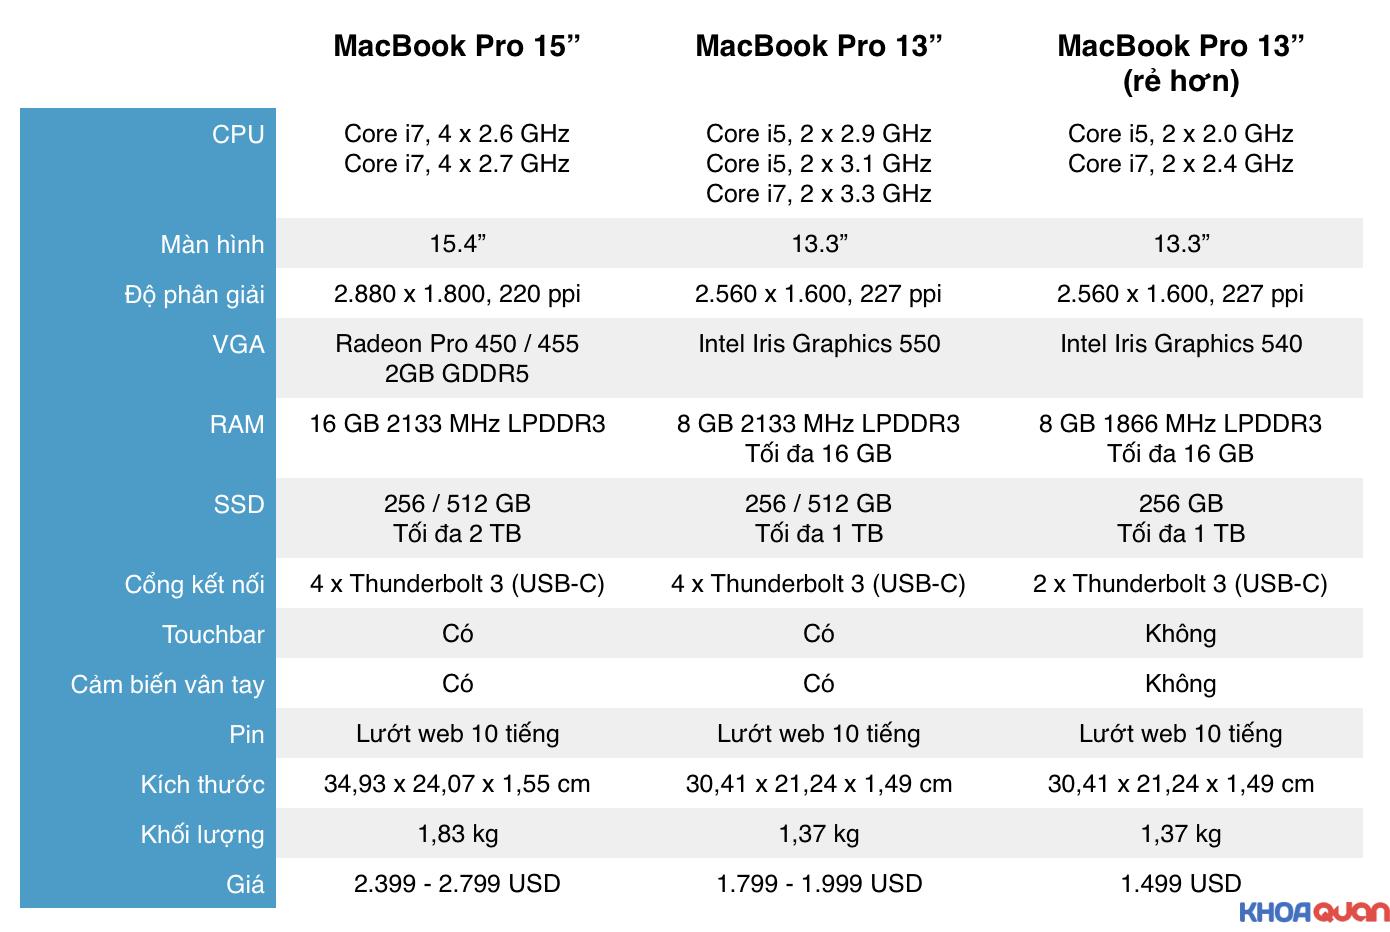 macbook-pro-2017-thiet-ke-lot-xac-va-manh-me-4